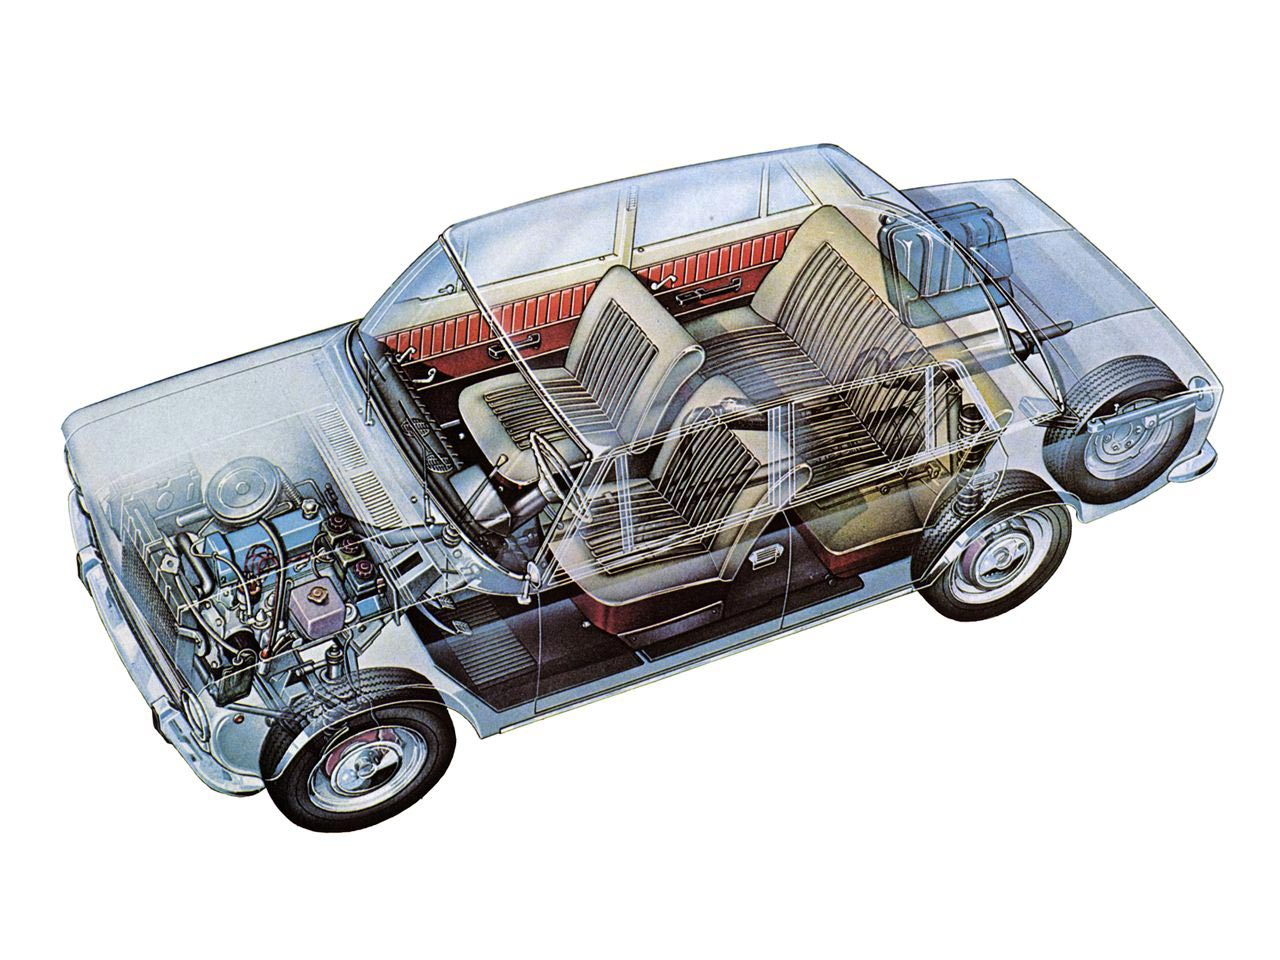 VAZ-2101 Zhiguli cutaway drawing